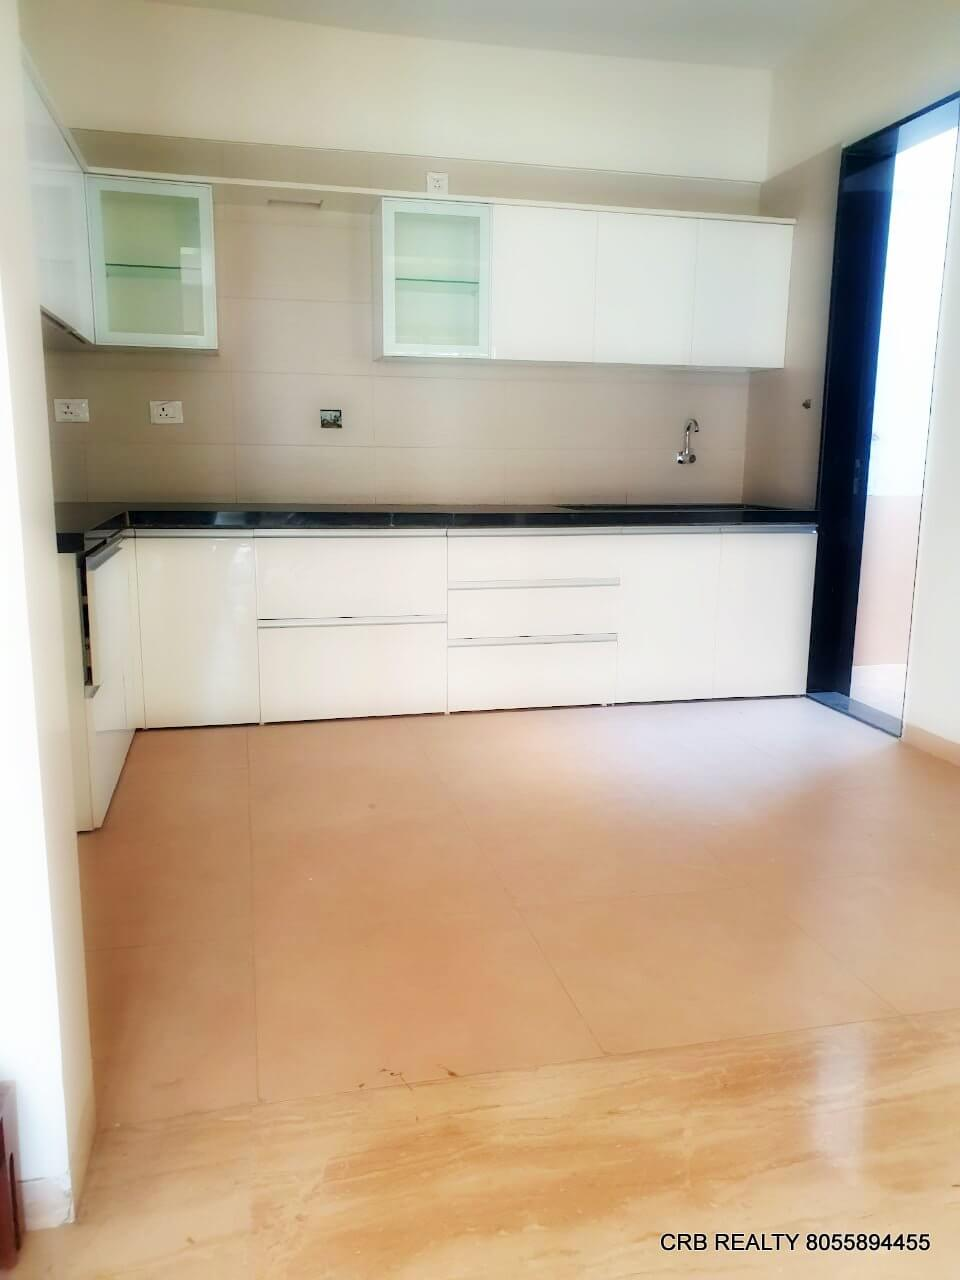 FOR SALE | NEW 3 BEDROOM APARTMENT | FRAGNANCIA, KOREGAON PARK, PUNE